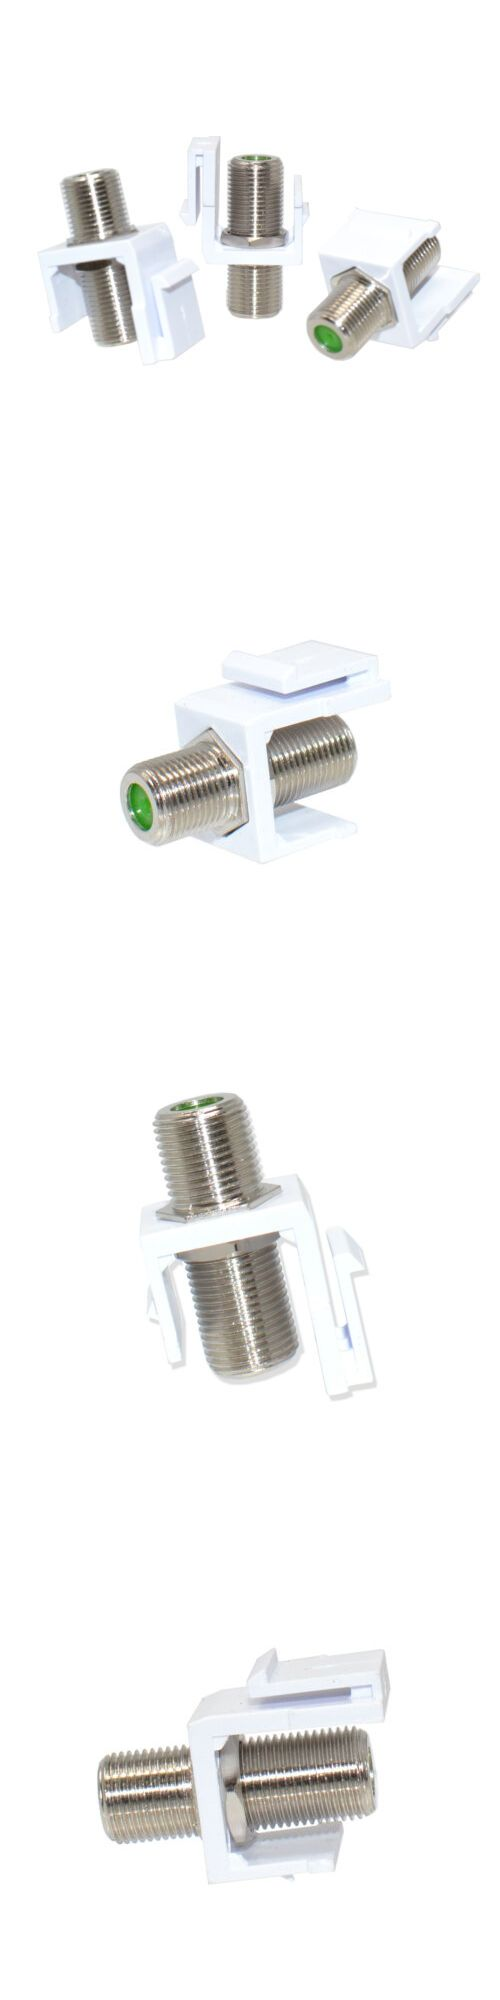 50 Pcs 4G Technology Snap-In F-Type Insert Keystone Jack Connector Modular White